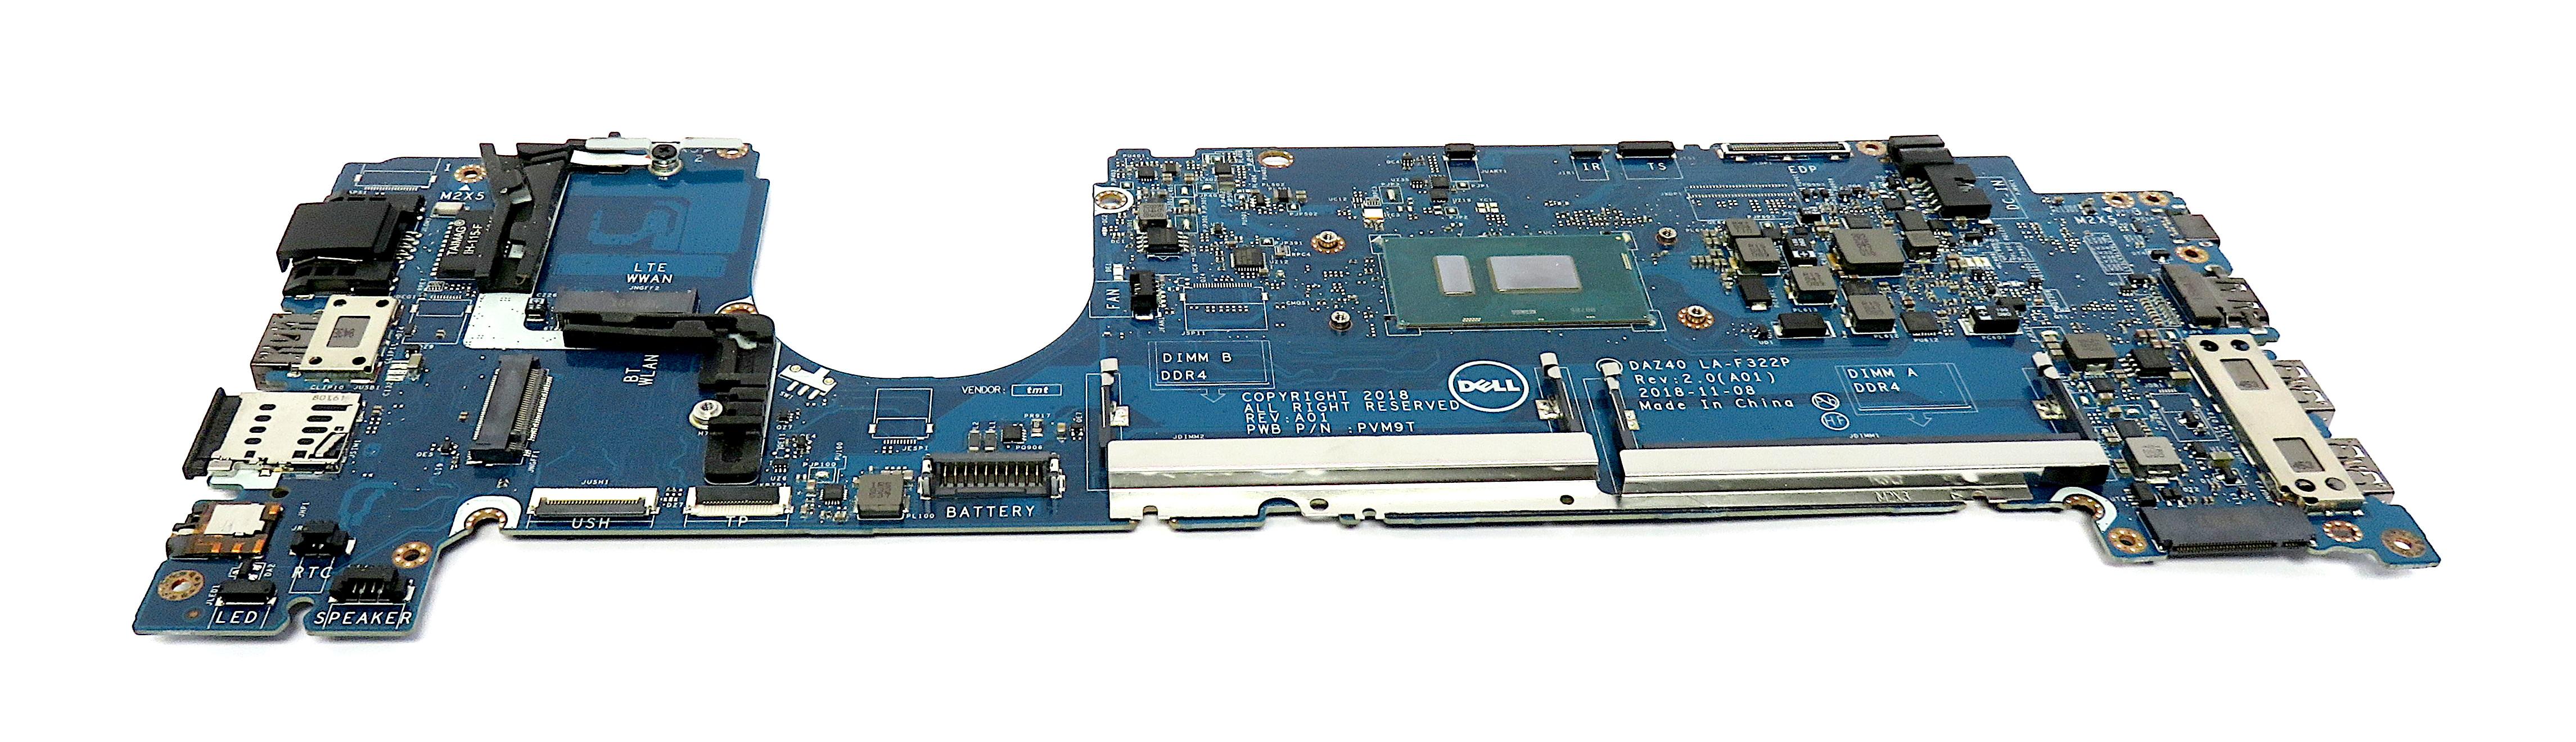 0T0VJ3 Dell Latitude 7490 Laptop Motherboard w/ BGA Core i5-8350U CPU